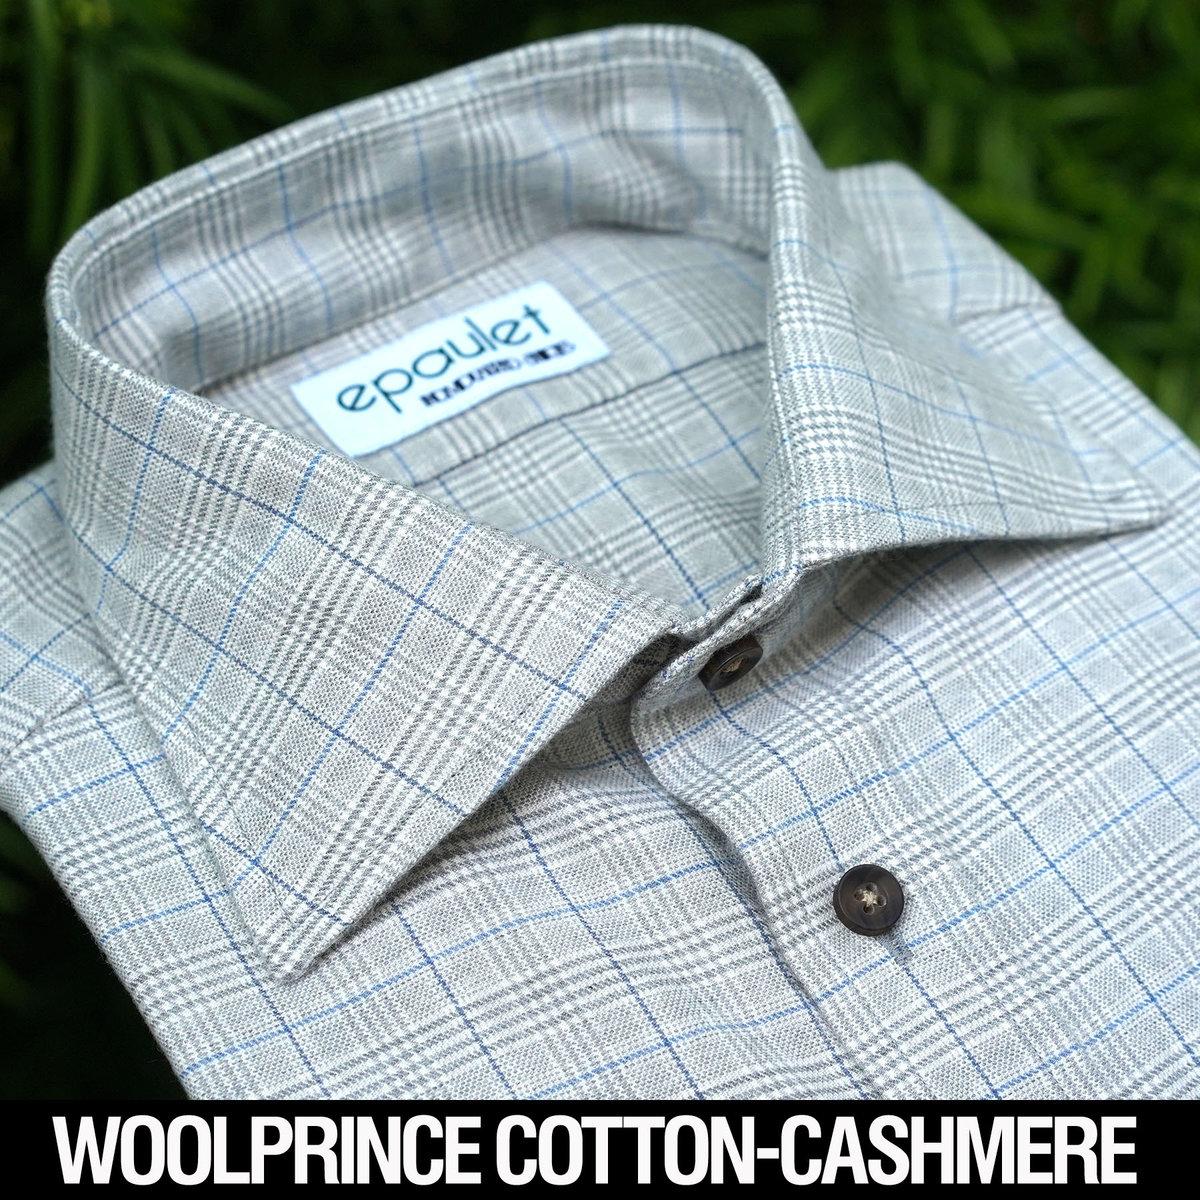 Woolprince Cotton-Cash.jpg